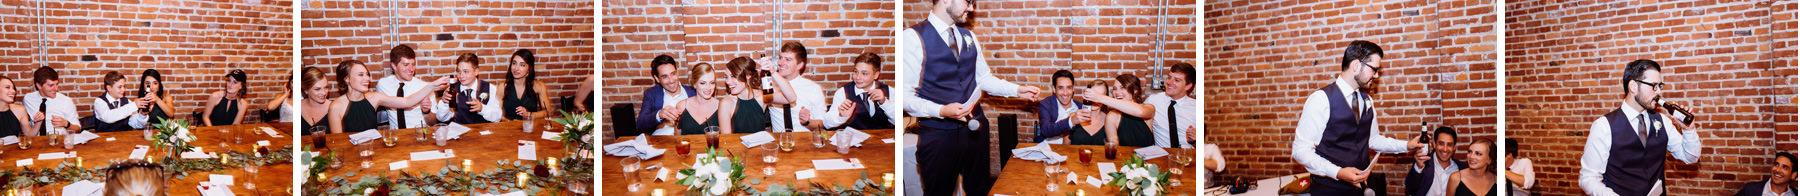 Kansas City Summer Wedding at the Guild_Kindling Wedding Photography Blog73.JPG